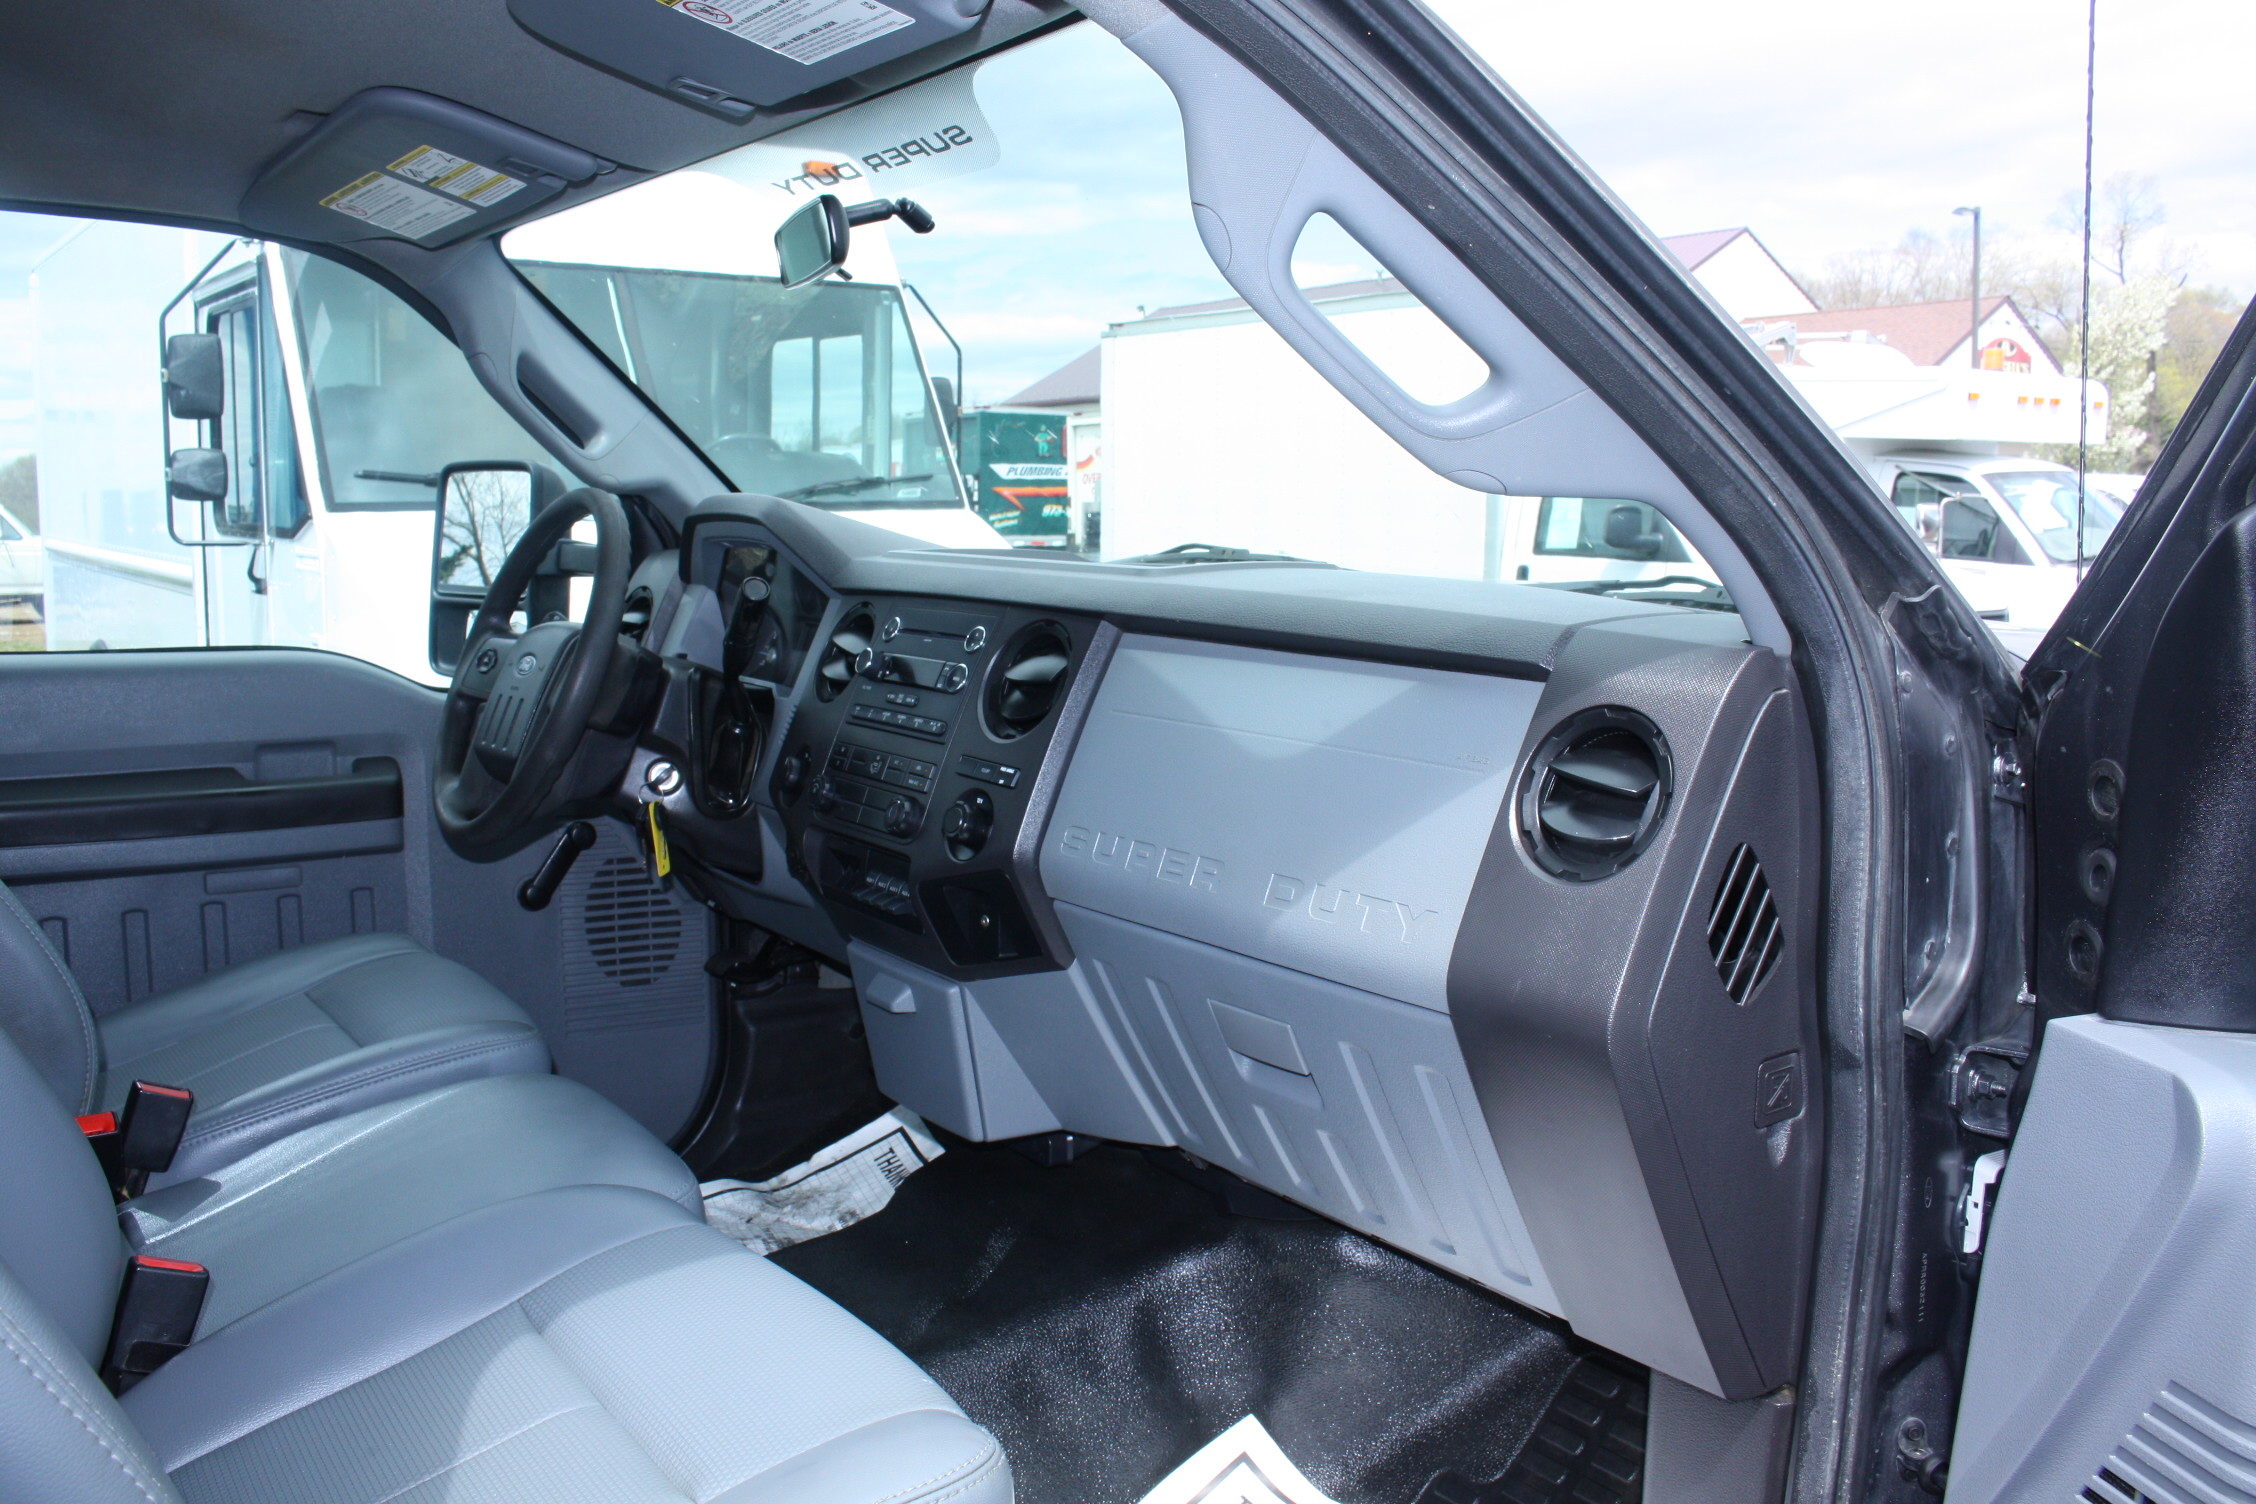 IMG 3562 - 2011 FORD F350 4X4 UTILITY